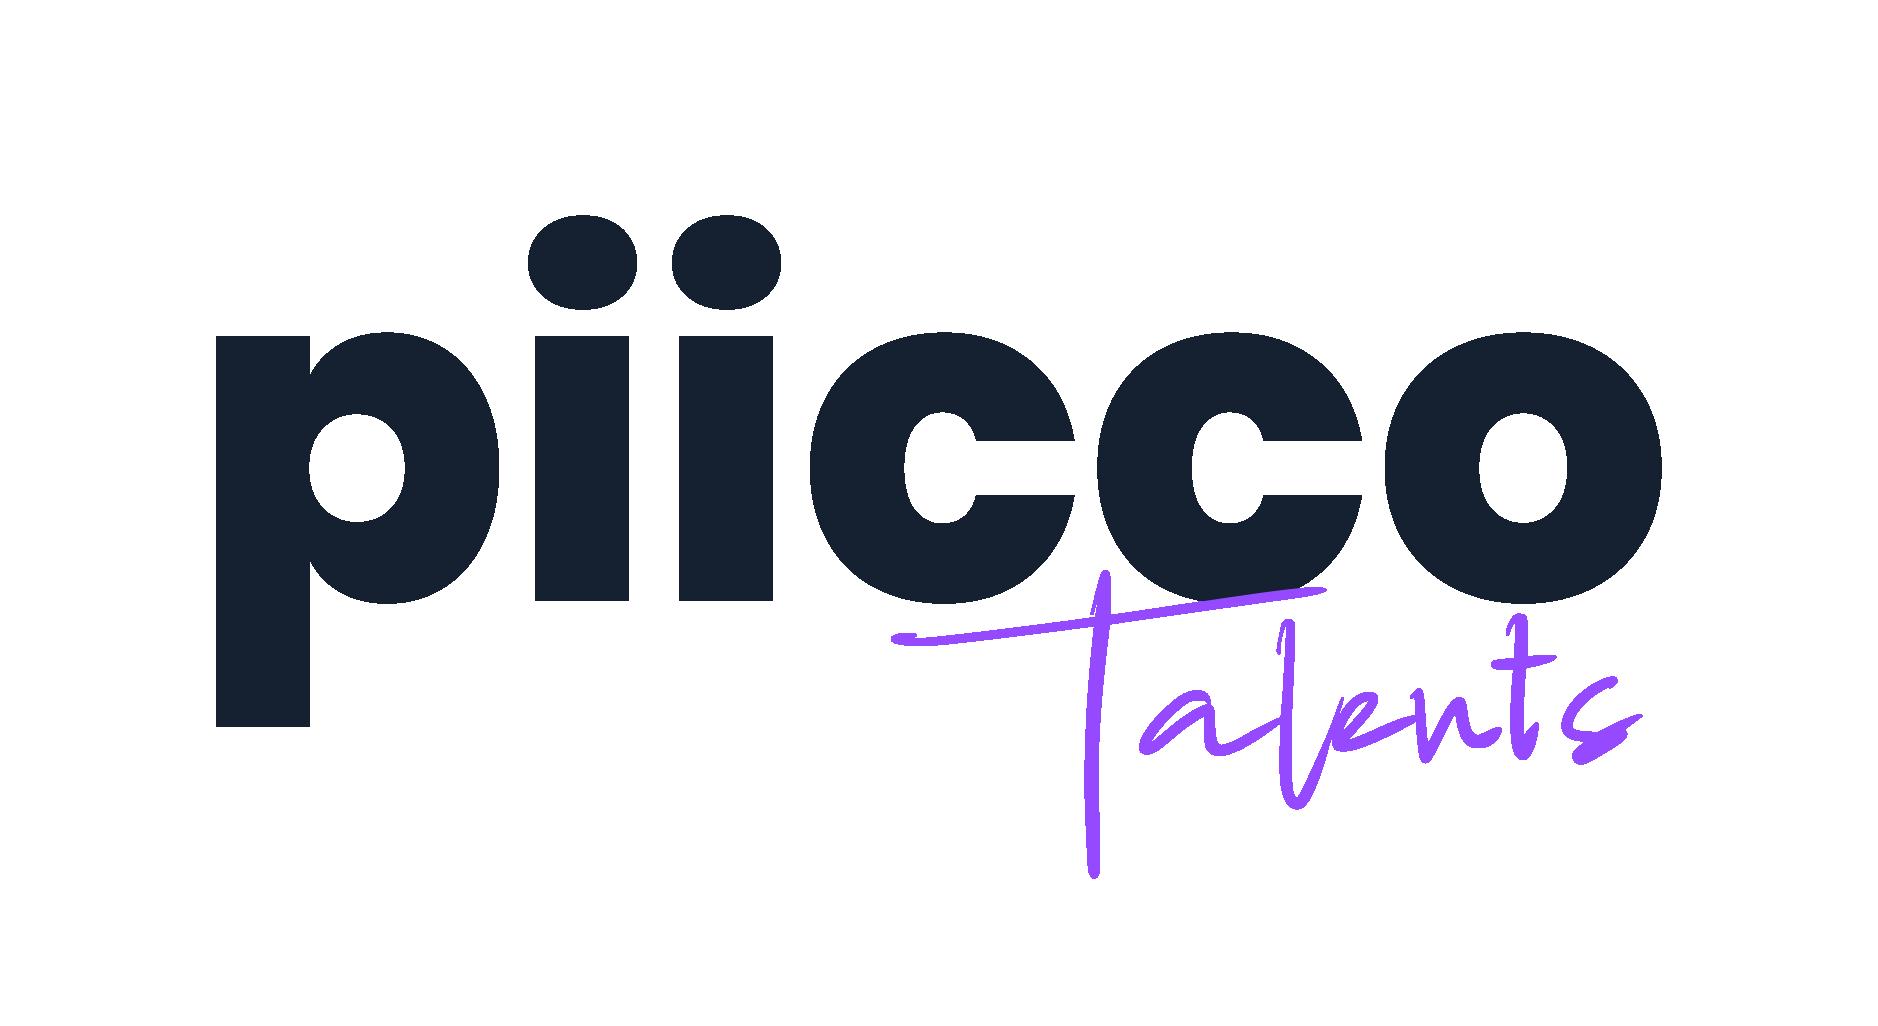 PIICCO Talents Inc.